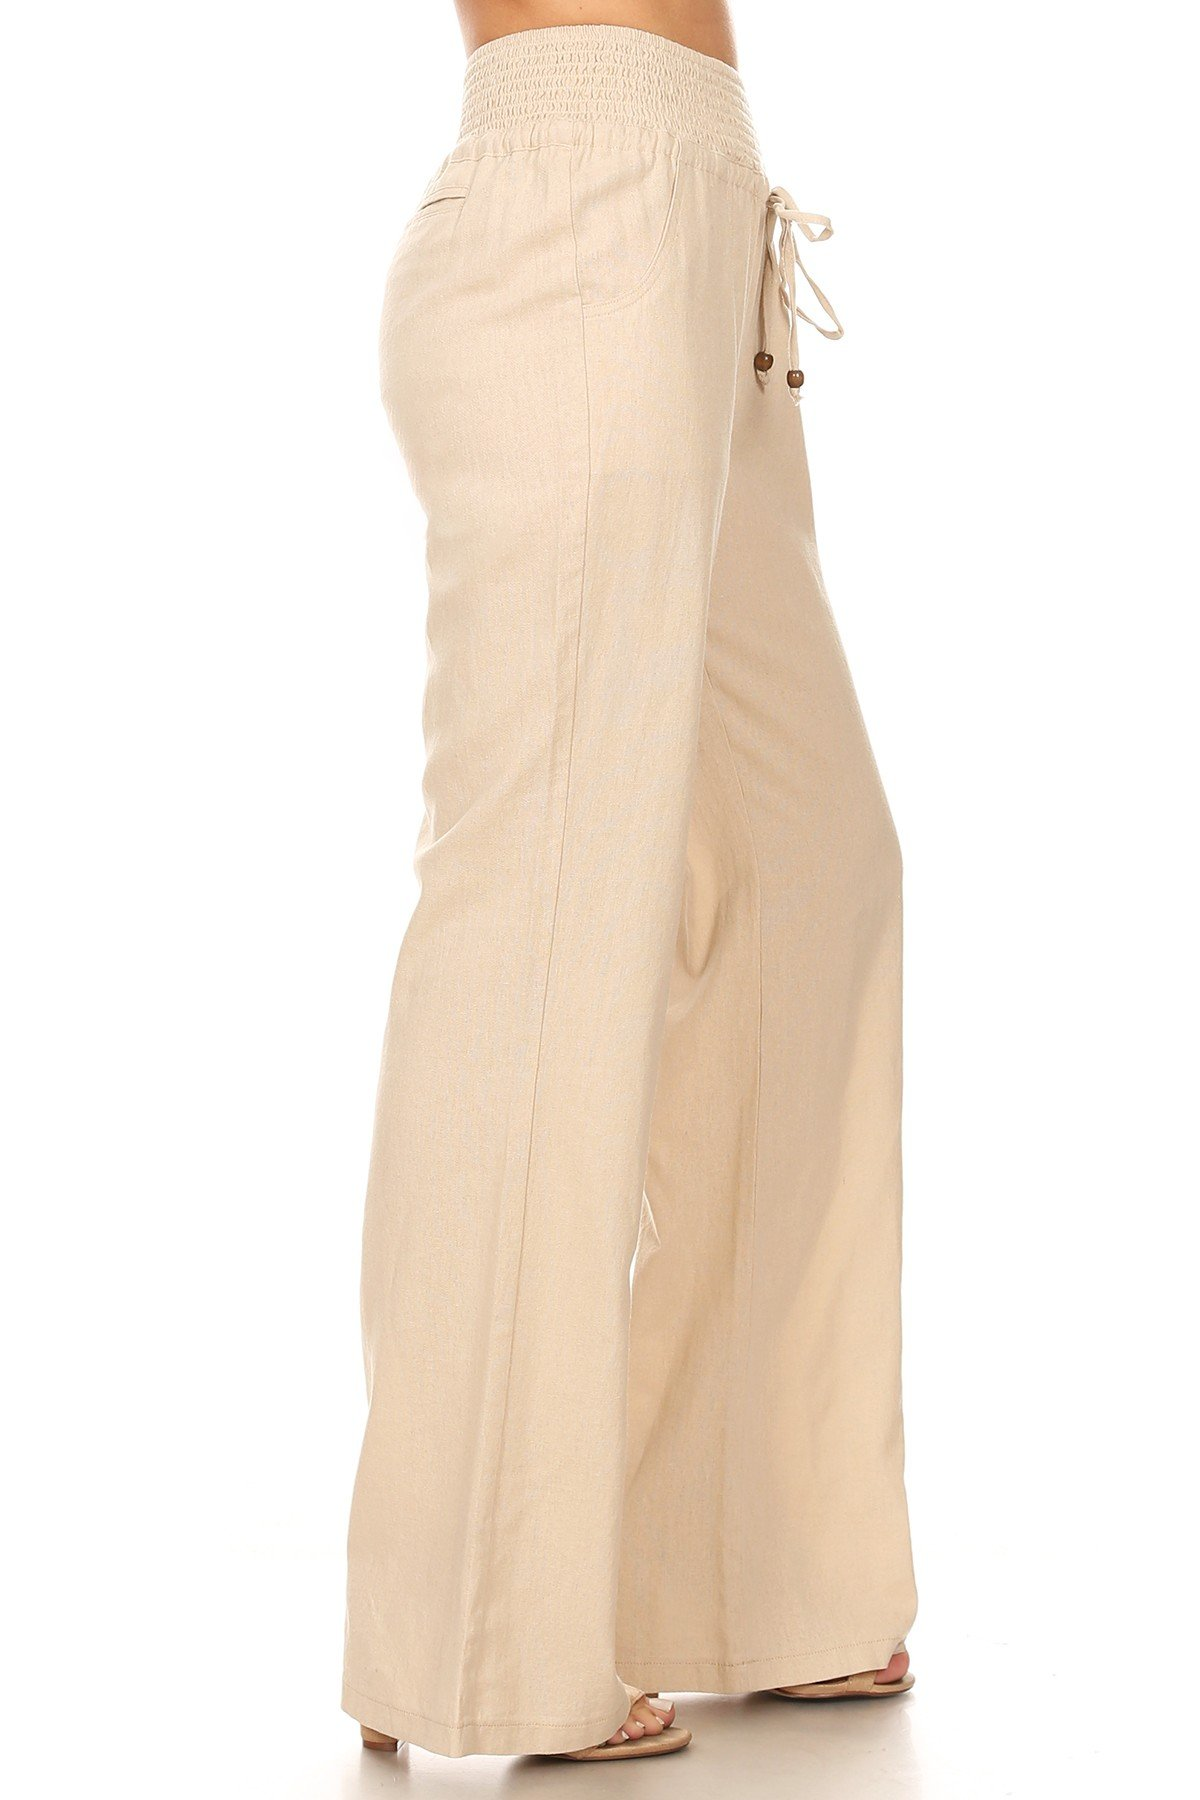 April Apparel Inc. Via Jay Women's Casual Relaxed-Fit Wide Leg High Waist Pants (Large, Khaki)